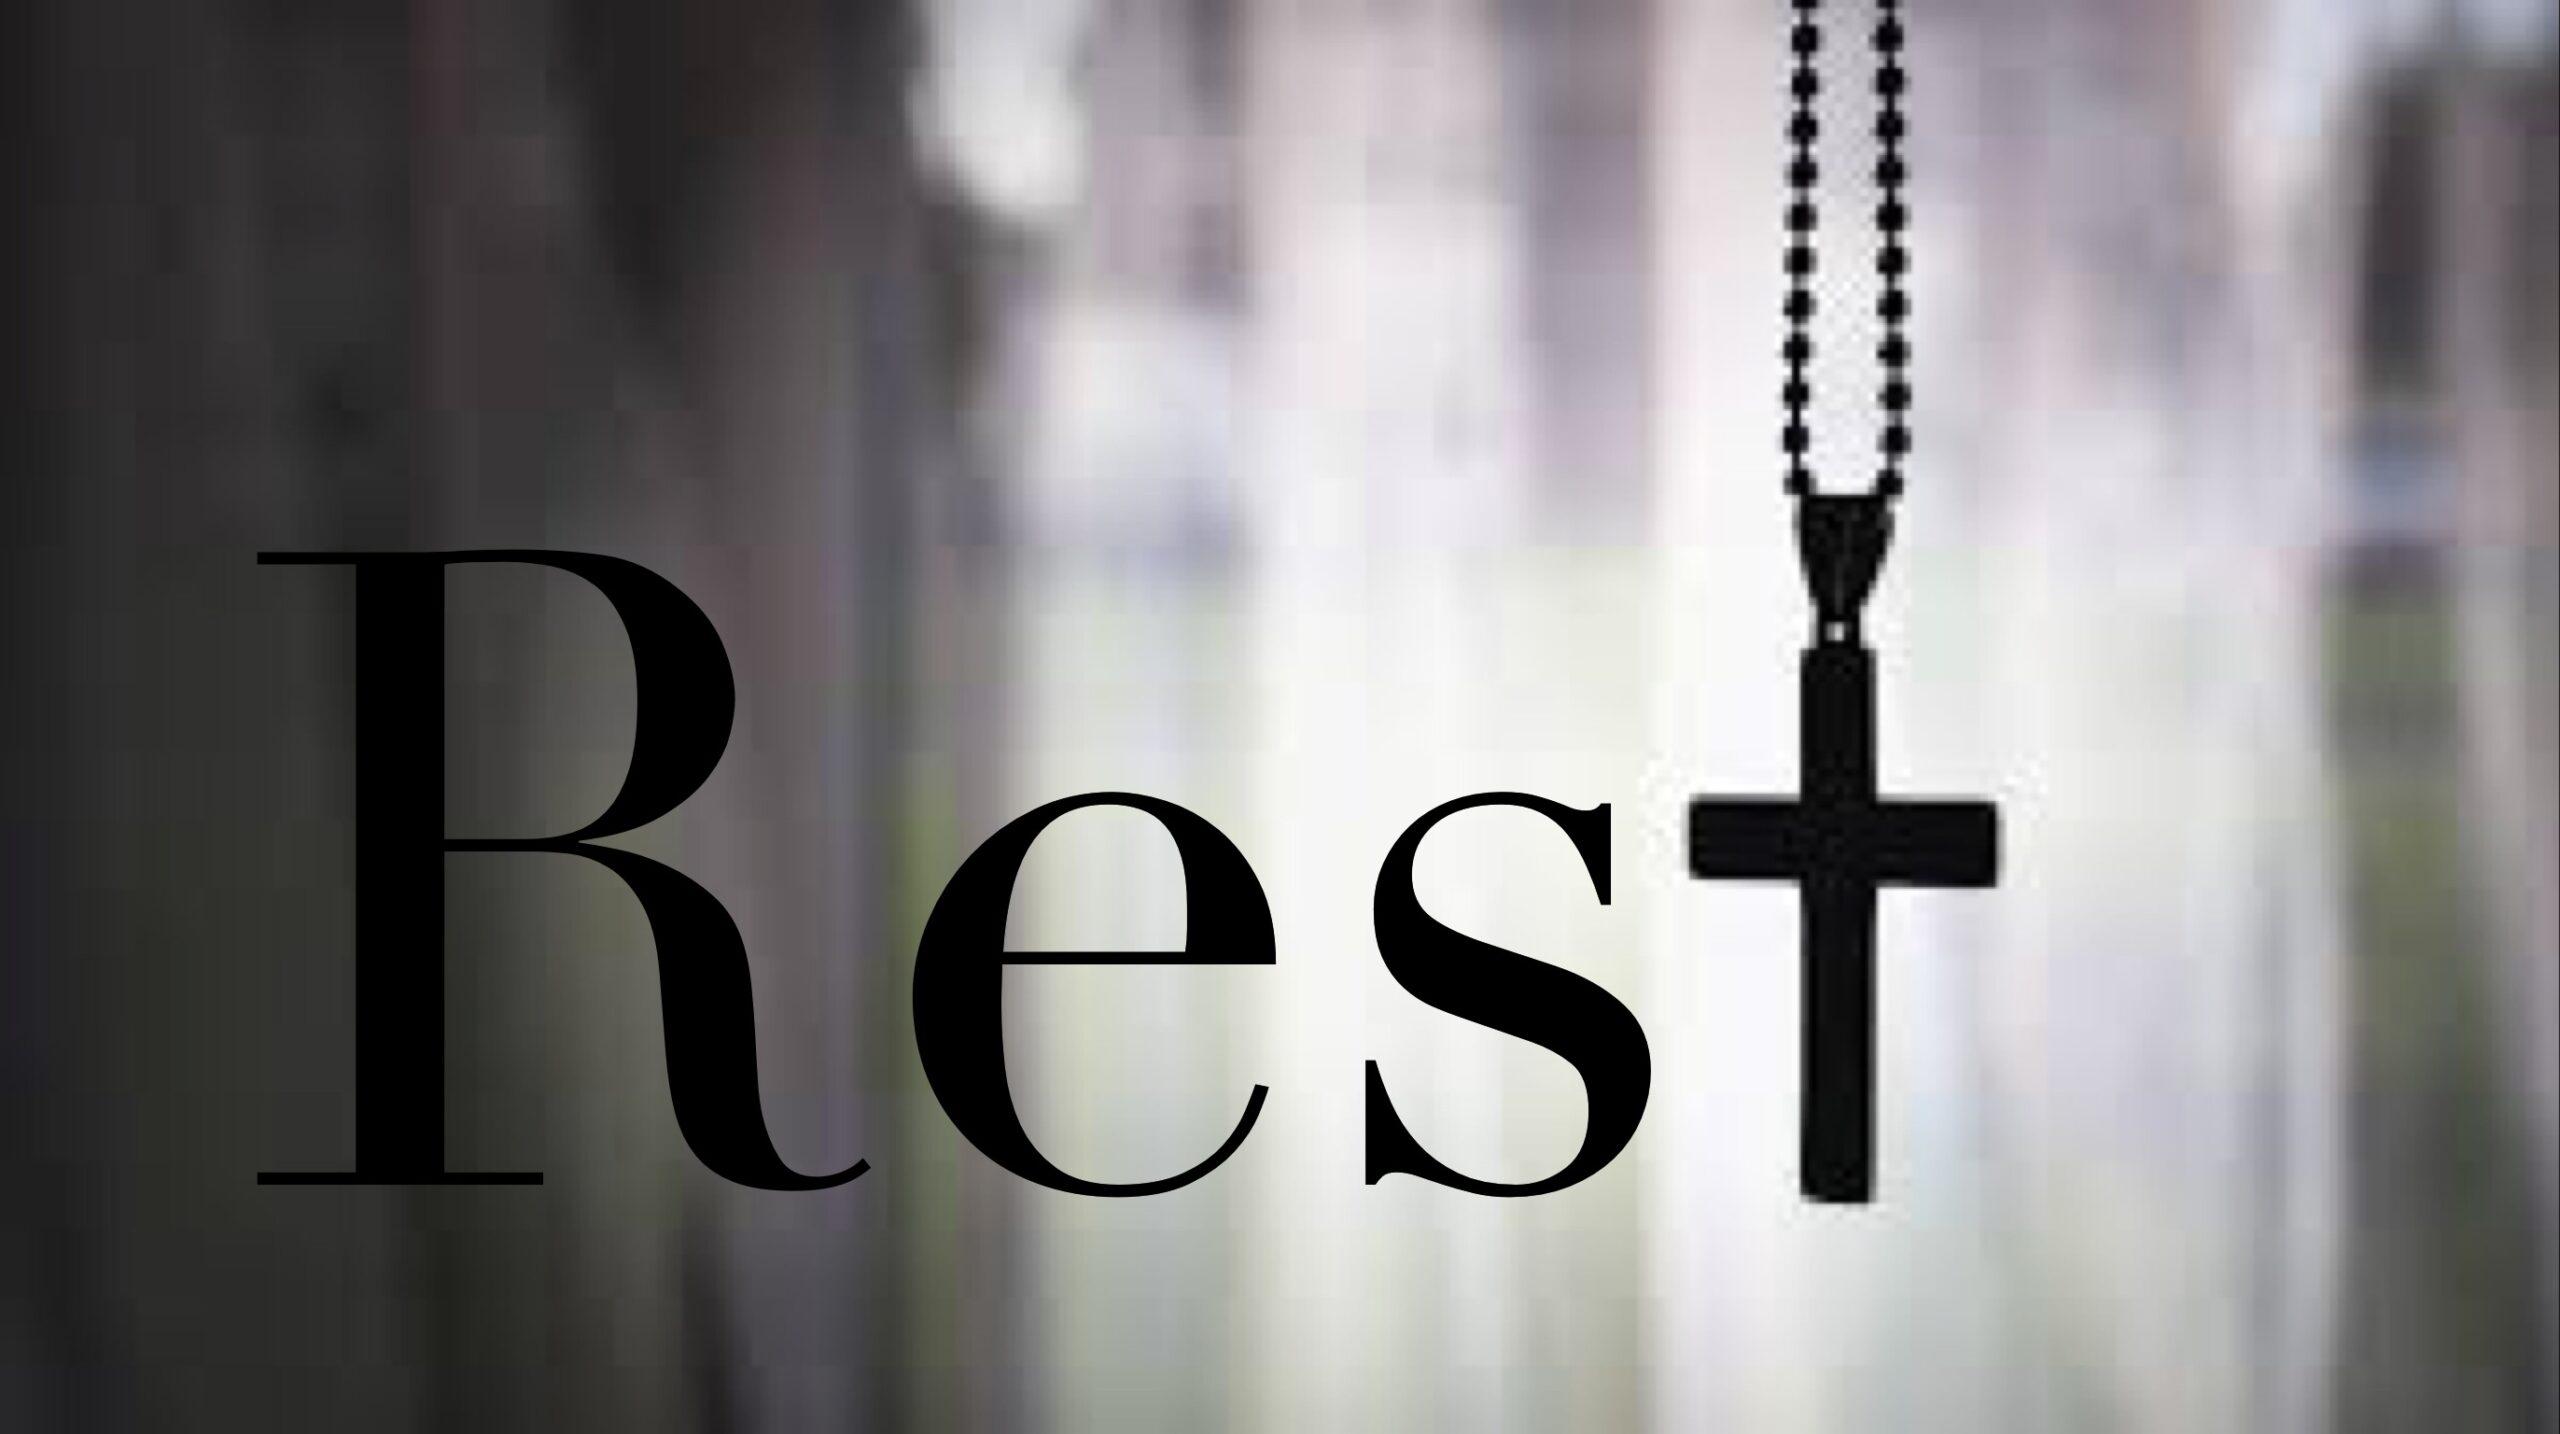 Honor God by Resting on Sundays